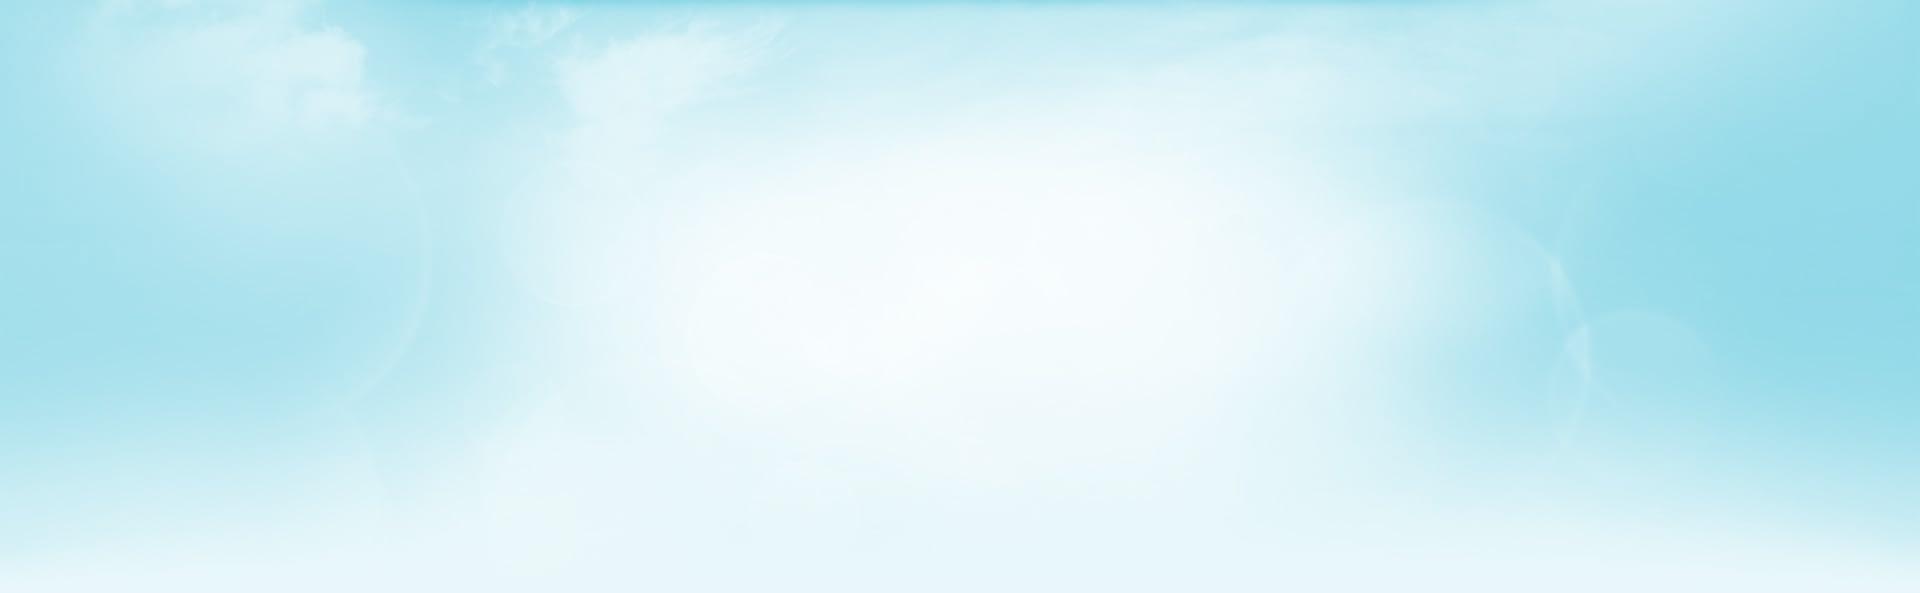 Hero_Header-Background